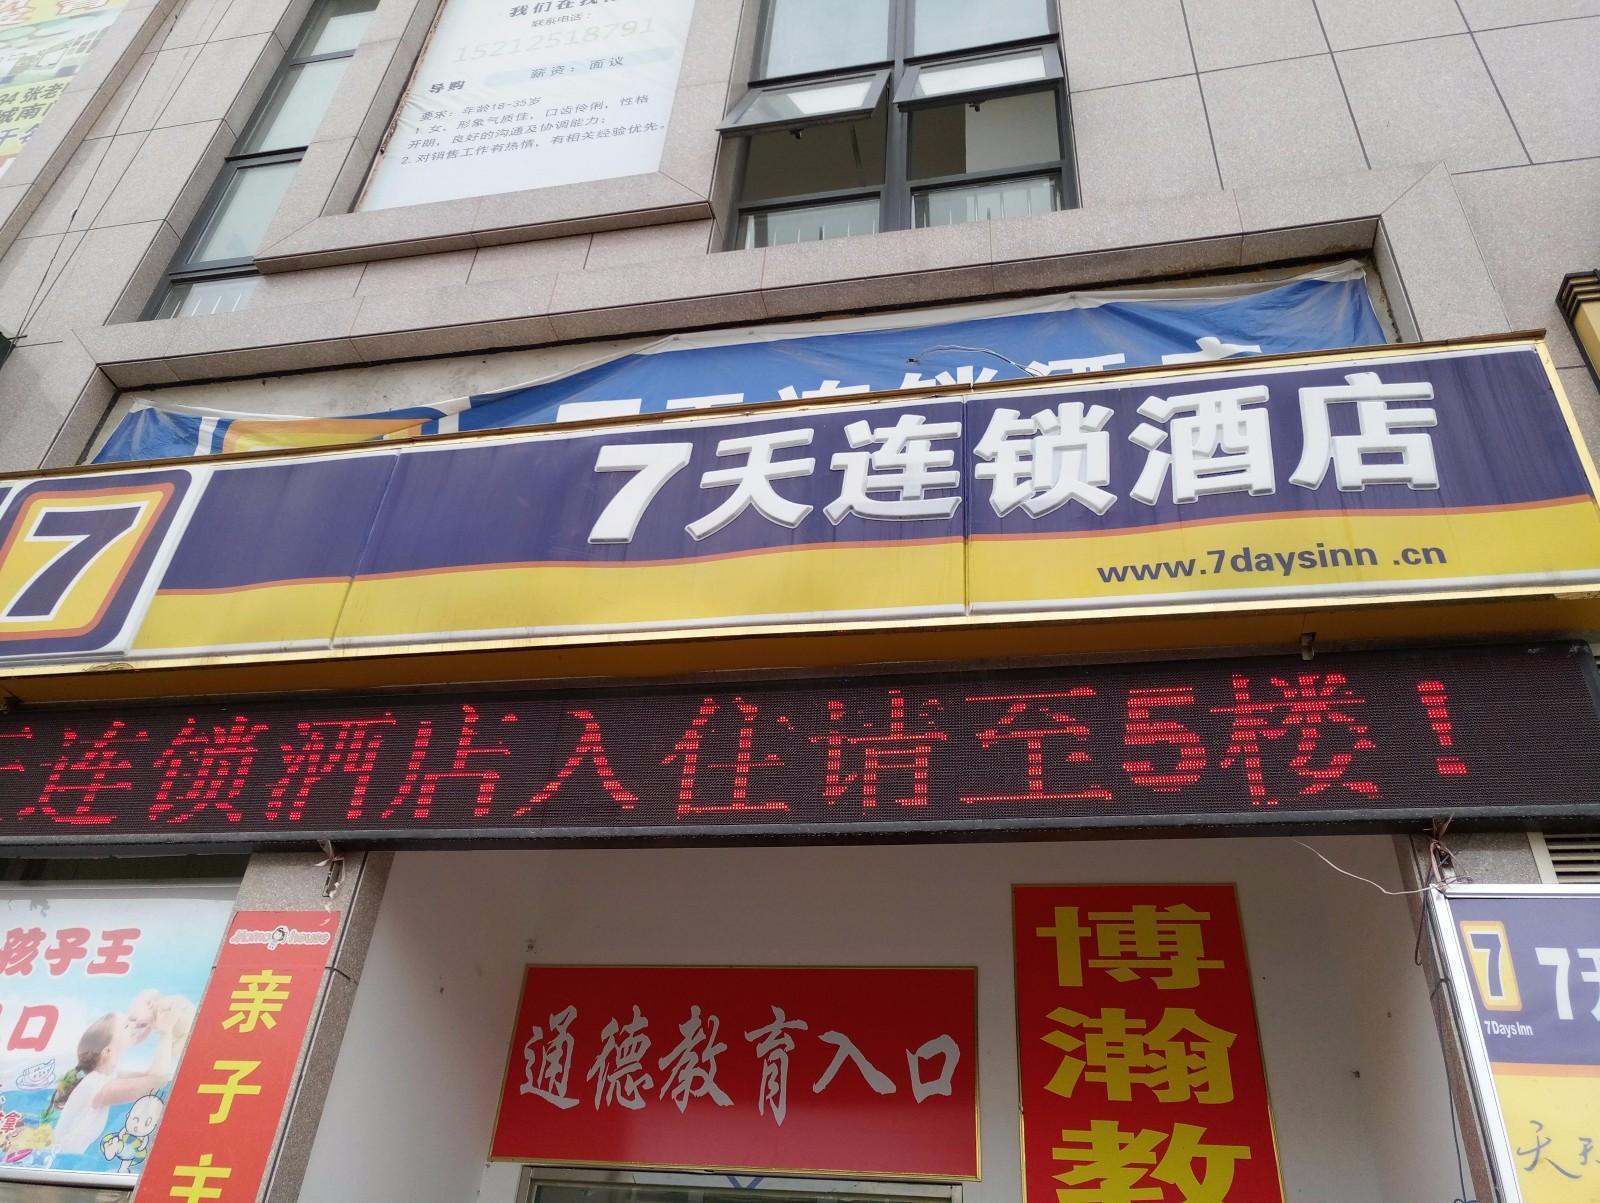 7 Days Inn·Suzhou Dangshan Oriental Ever-bright City, Suzhou